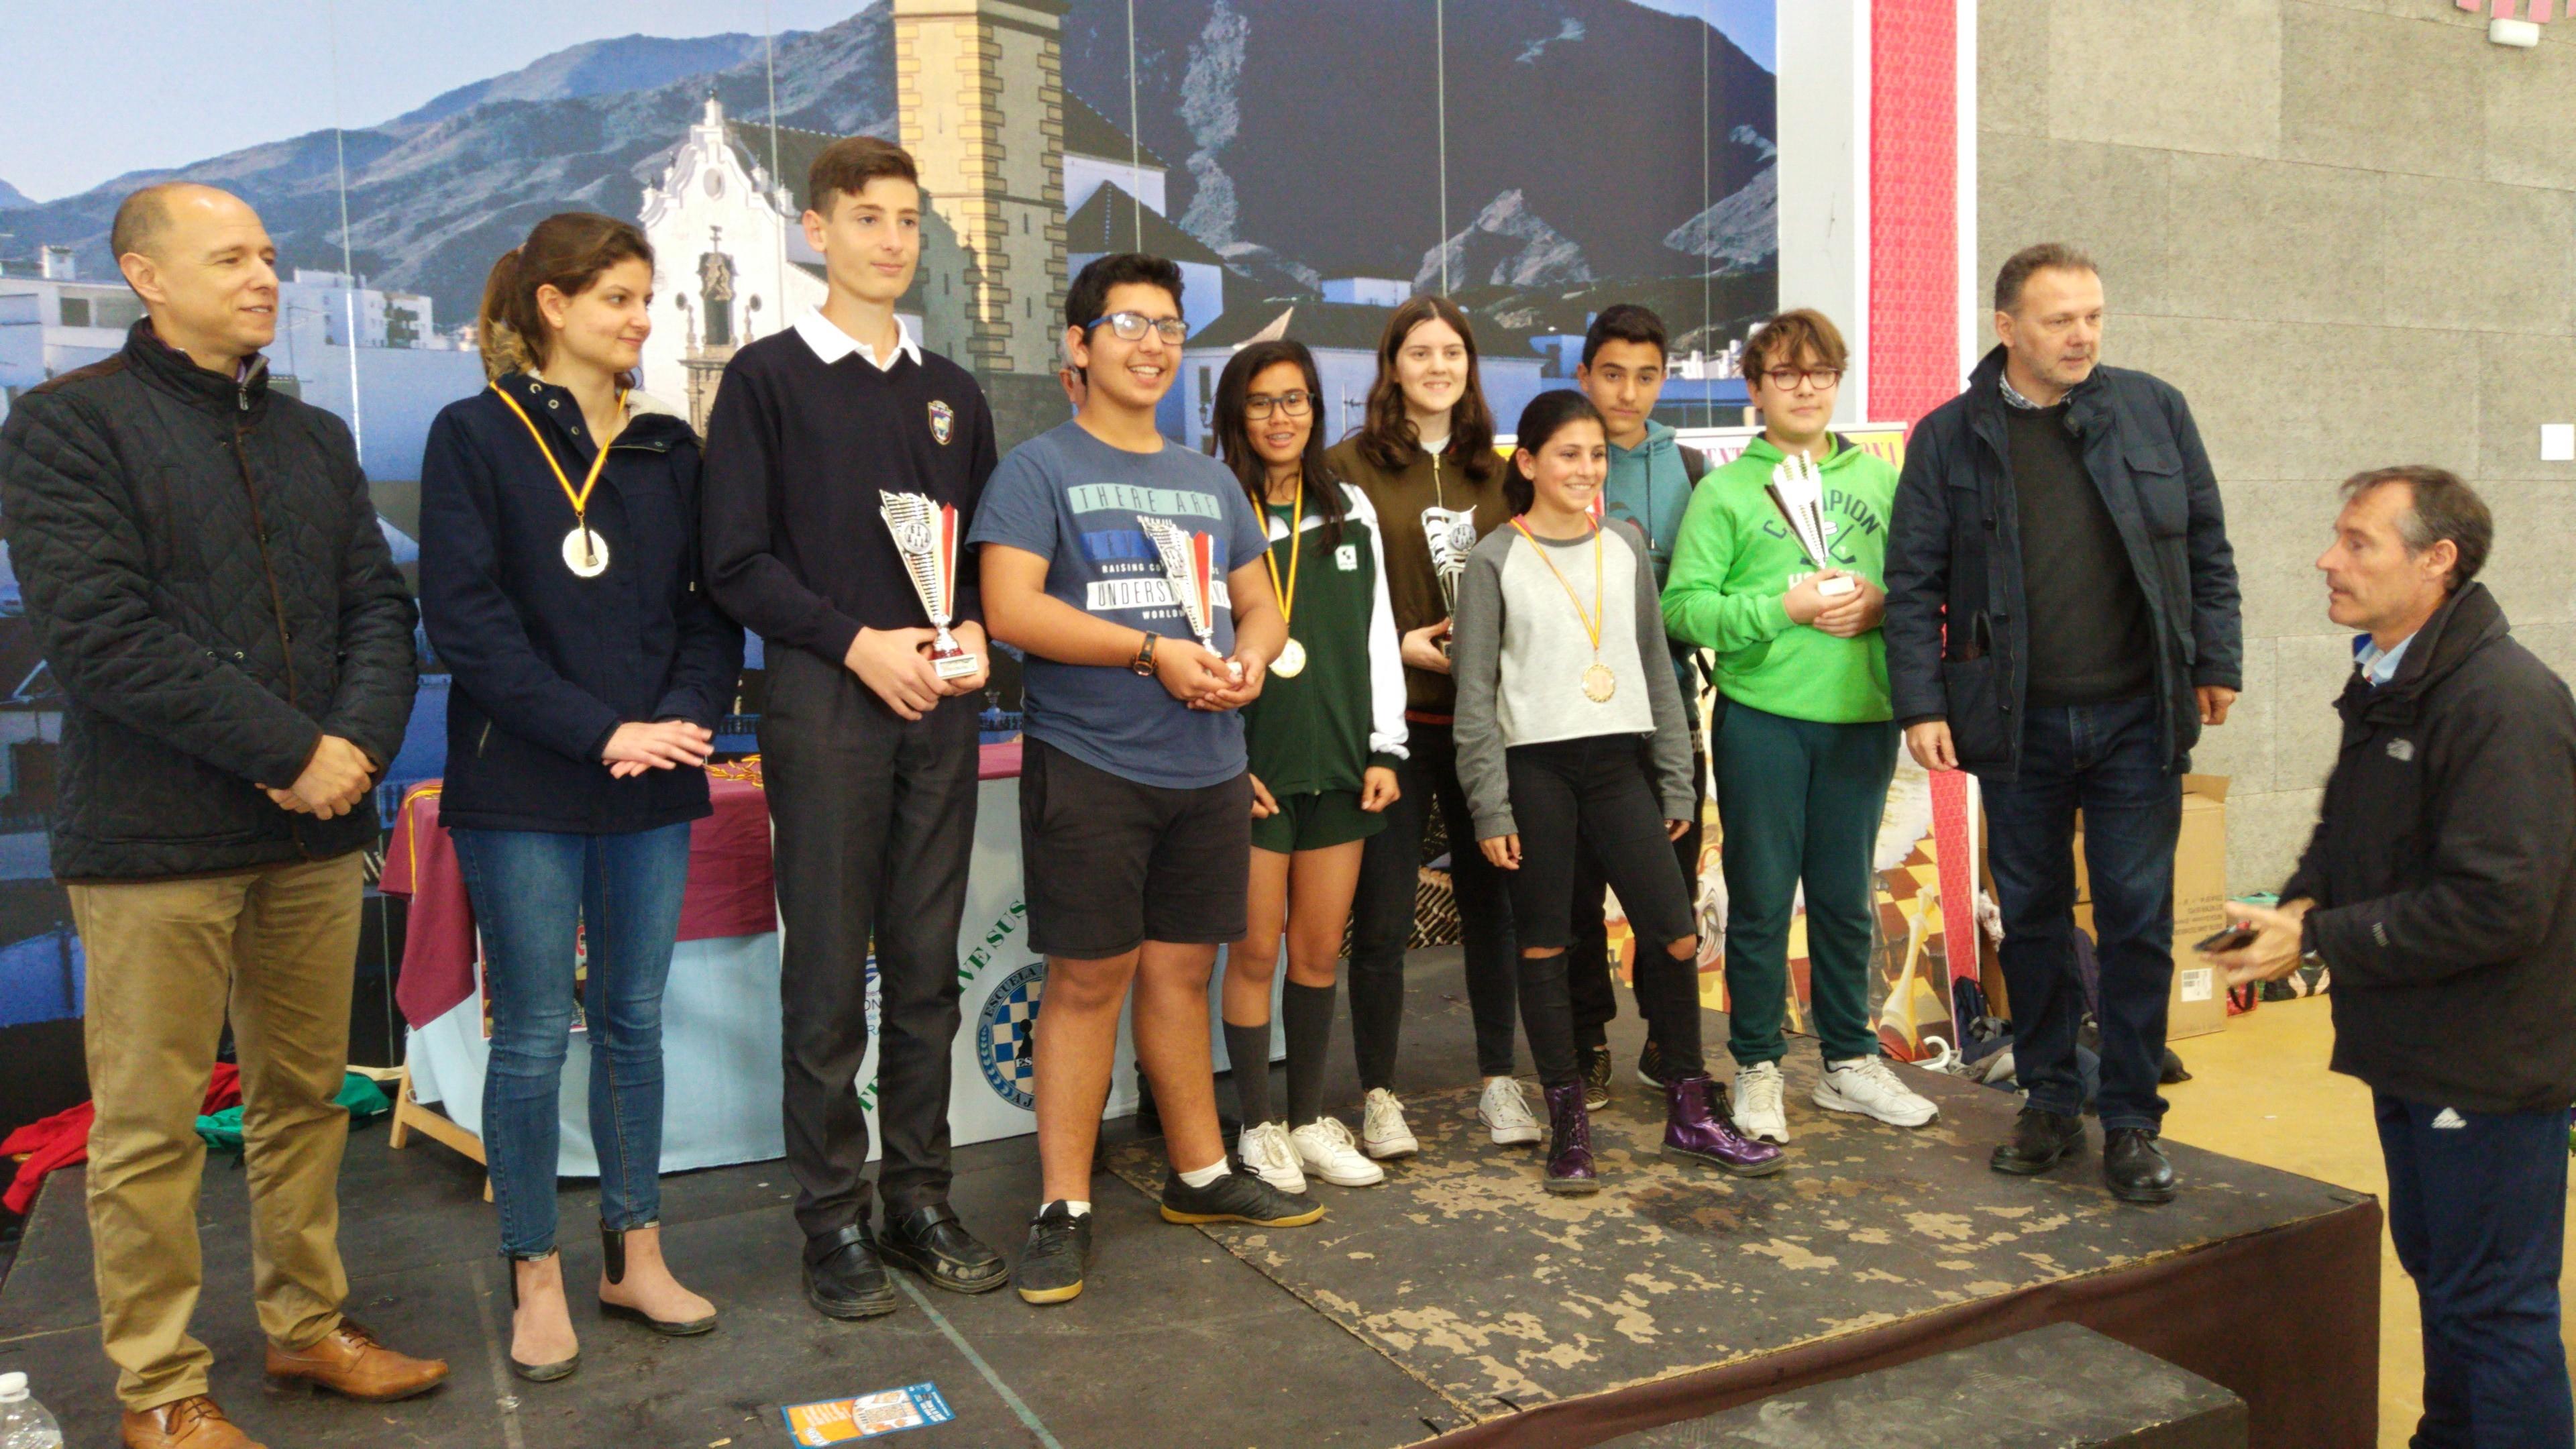 Imagen de la noticia: I.E.S. Mediterráneo Campeón Municipal de Ajedrez 2019.   [Actualizado]